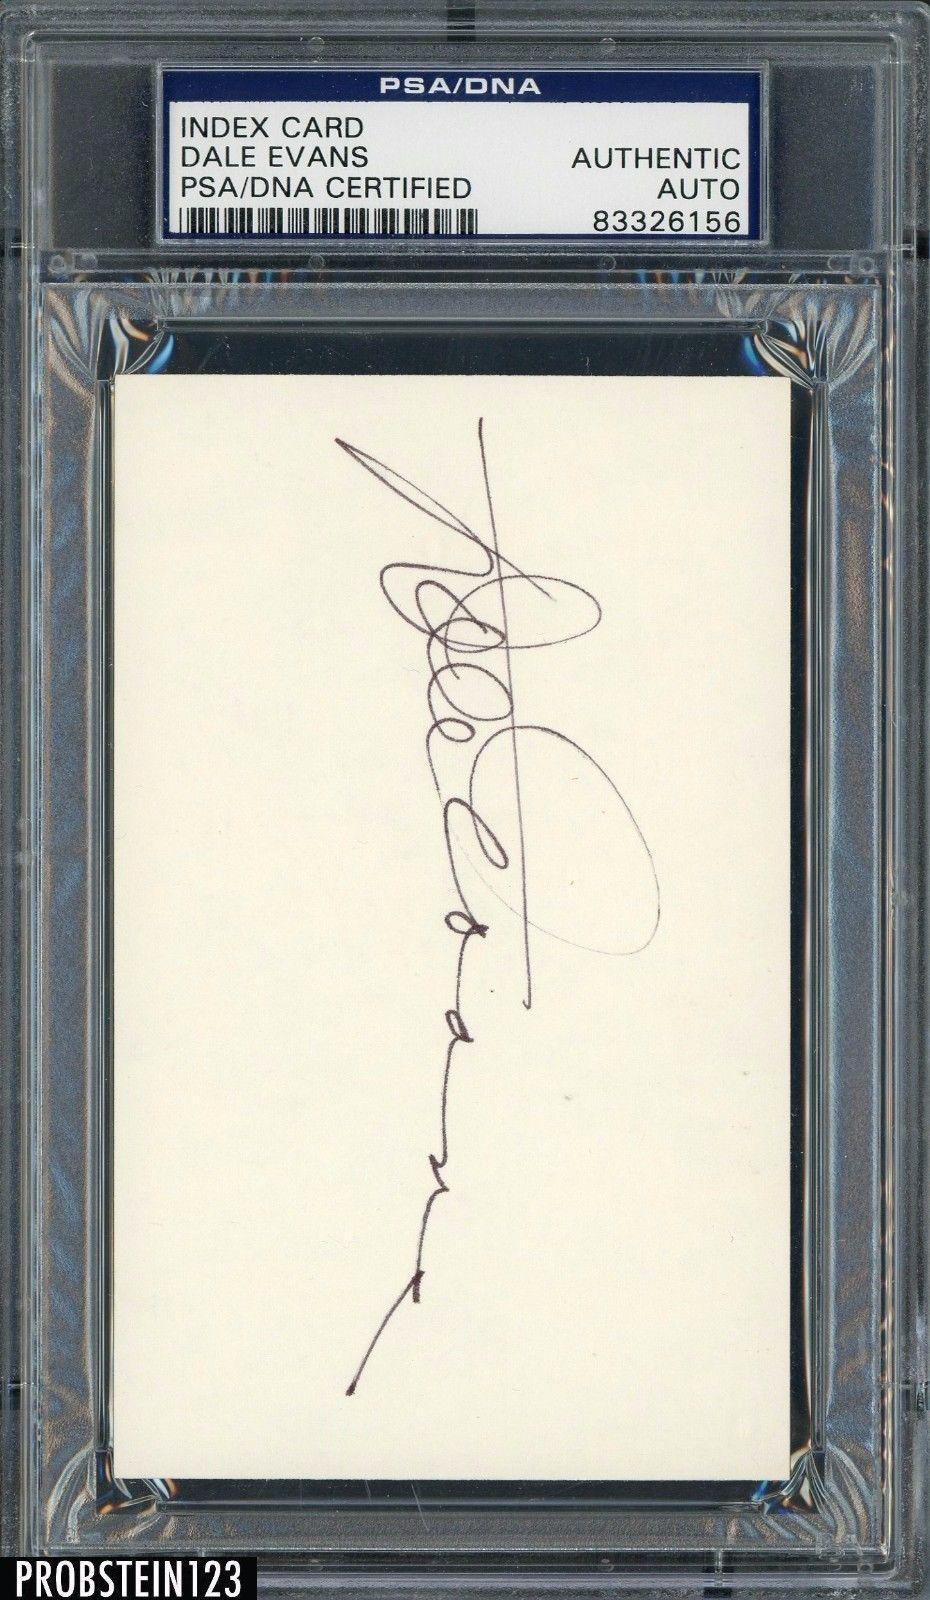 Catherine Deneuve Signed Index Card Signature Autographed Auto Autographs-original Cards & Papers